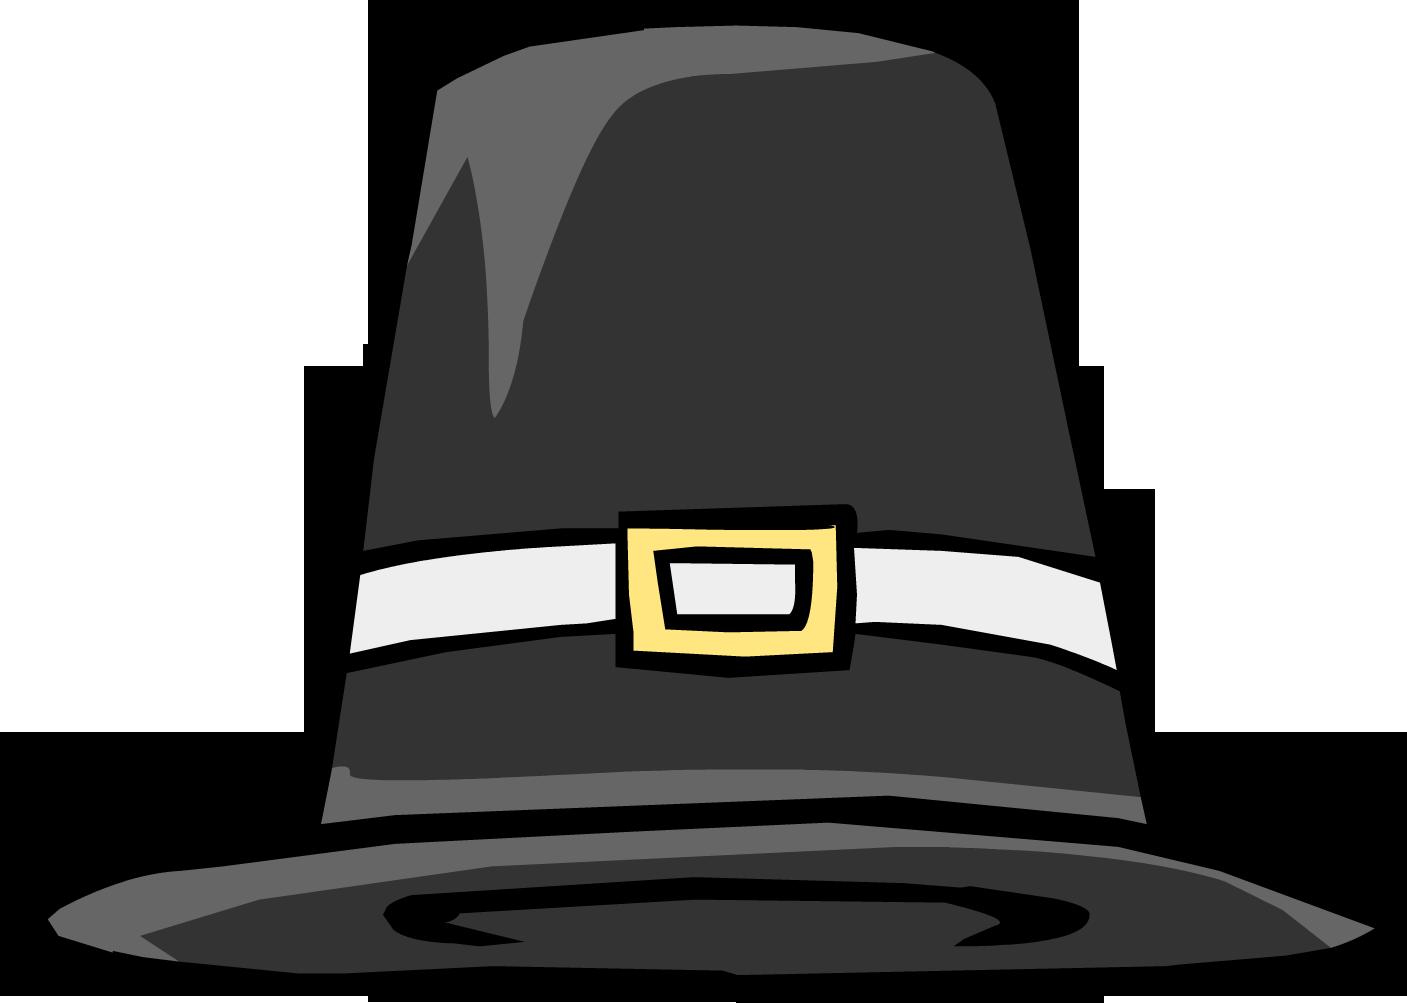 Pilgrim hat club penguin wiki fandom powered by wikia pilgrim hat pronofoot35fo Choice Image